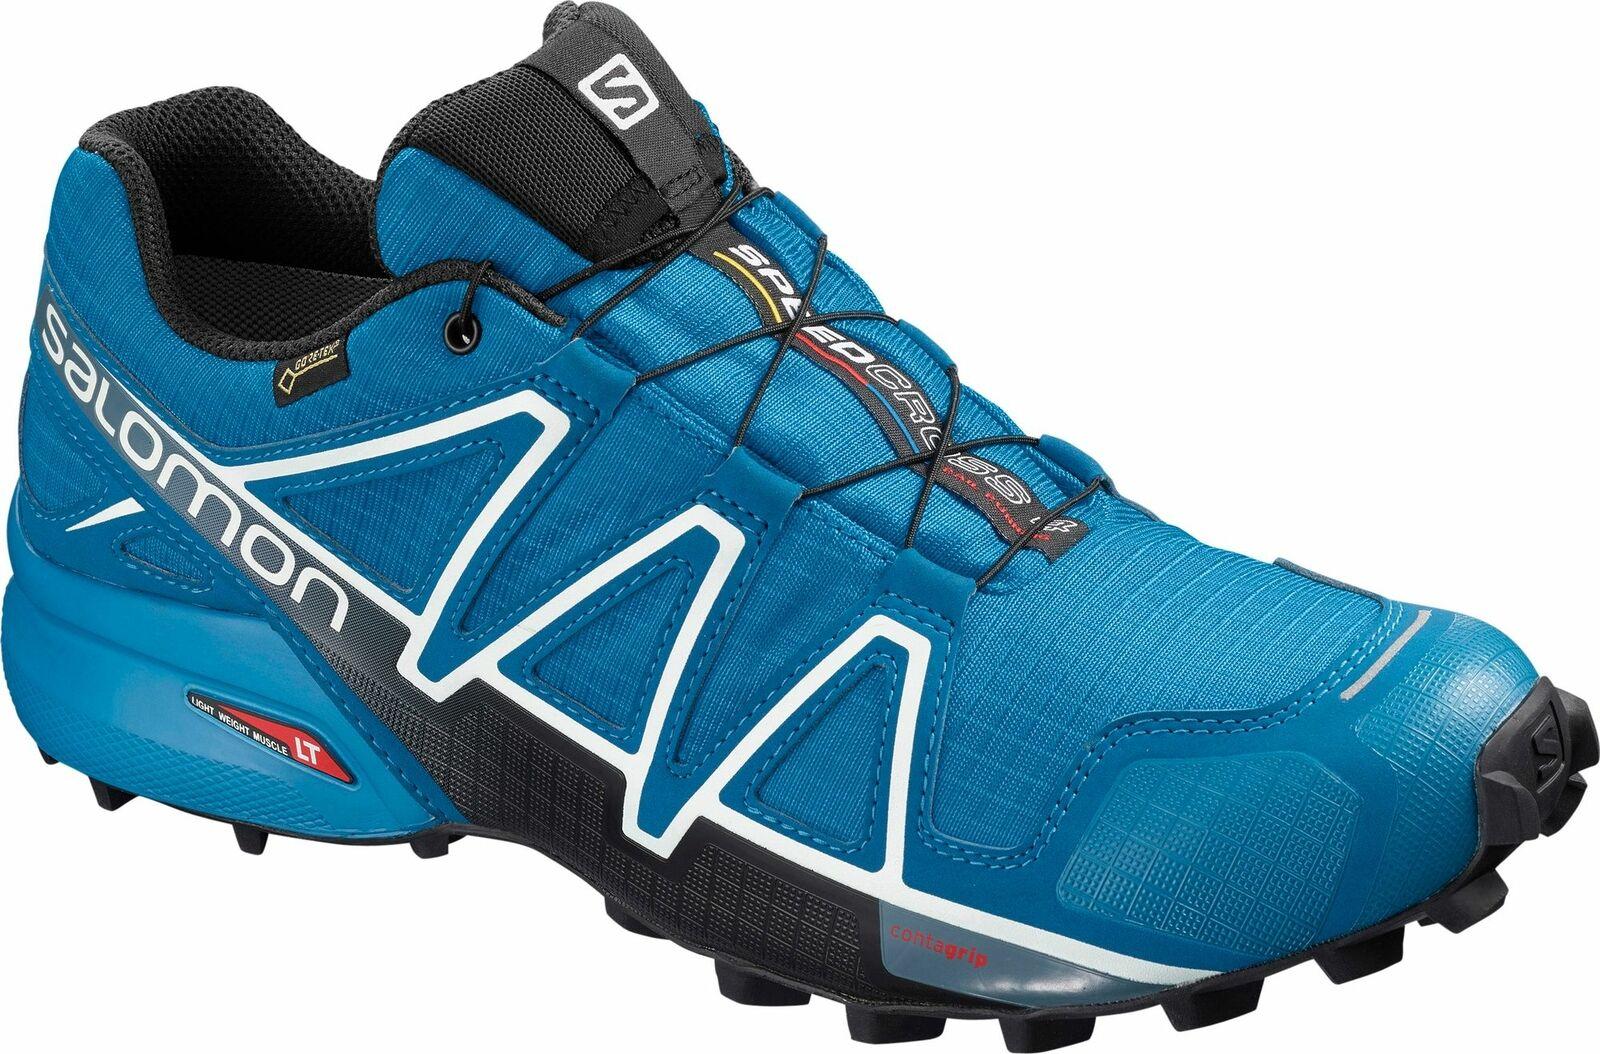 Salomon Speedcross 4 Zapatos Casuales Zapatos de Senderismo